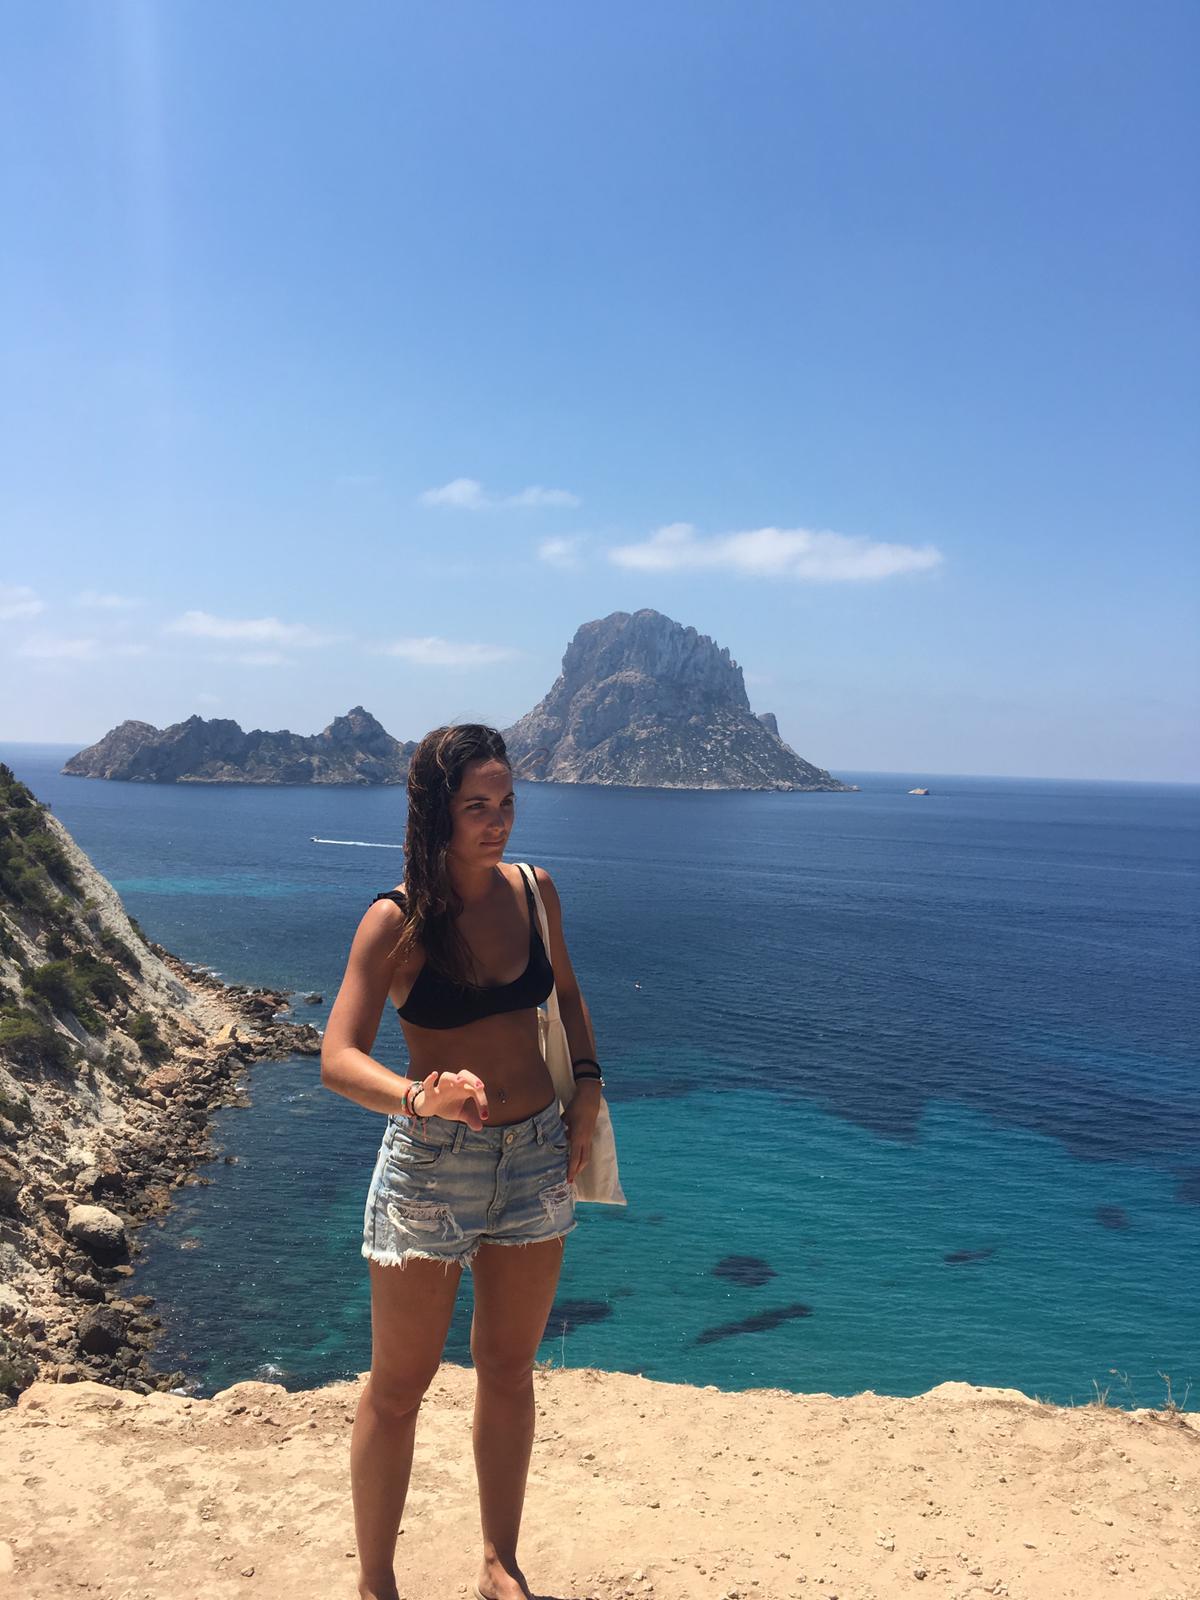 e4049bbb-aa4d-4b61-En Ibiza